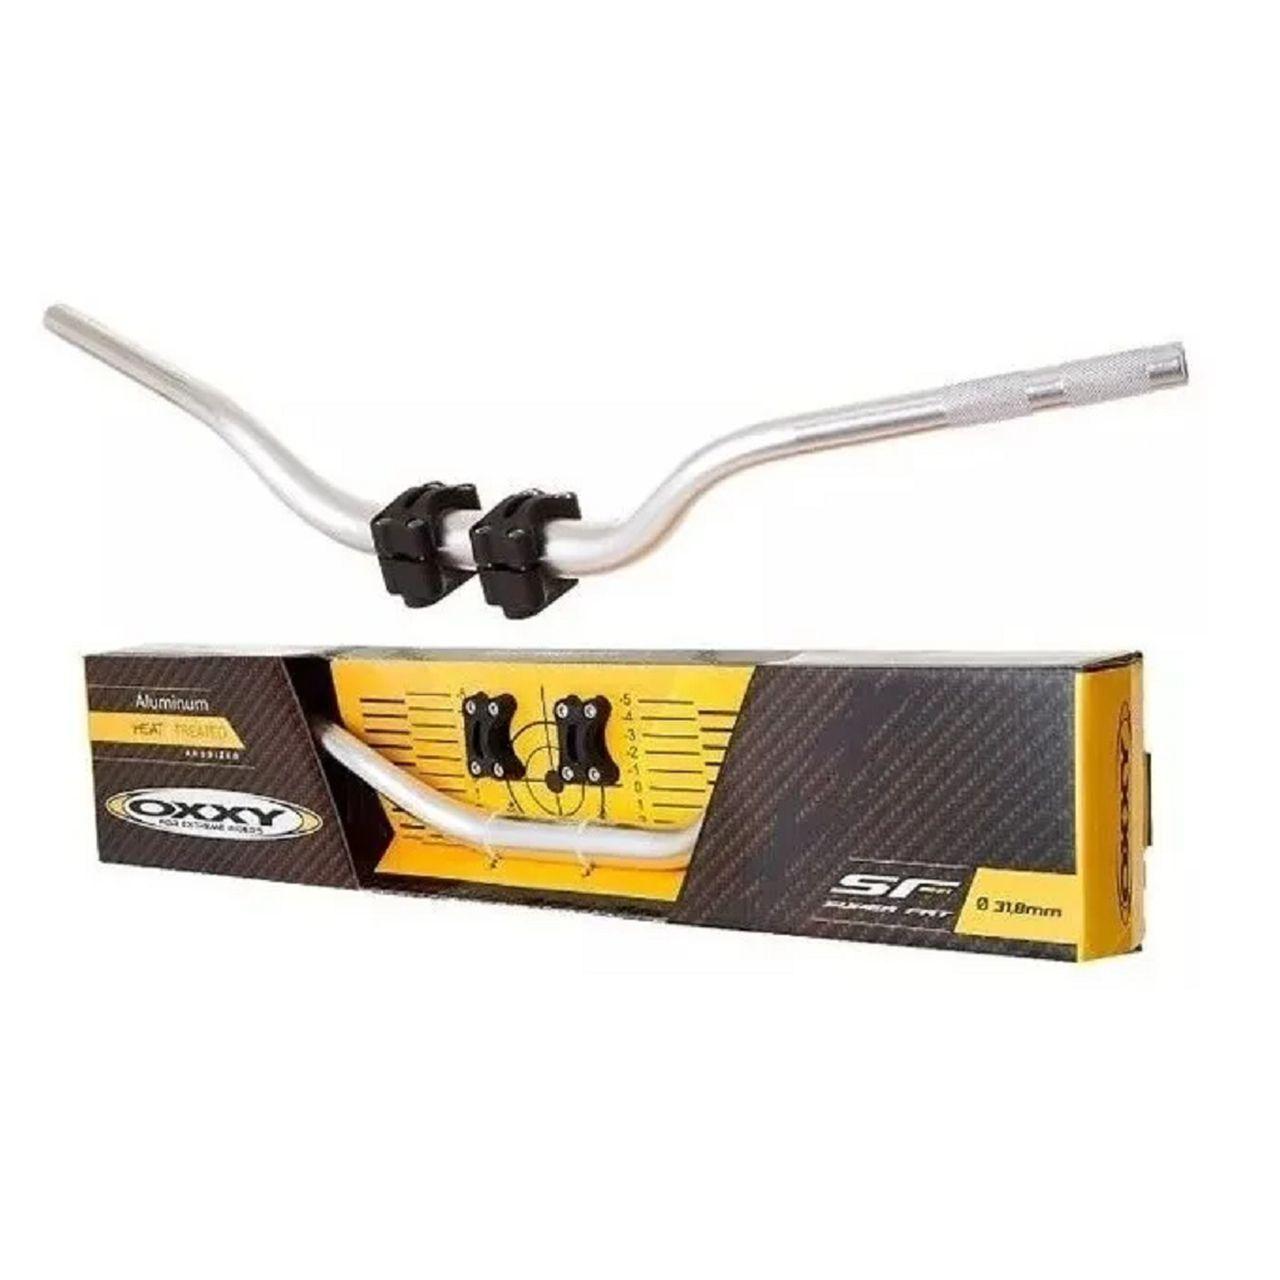 Guidão + Adaptador Oxxy Super Fat Bar - Prata Baixo